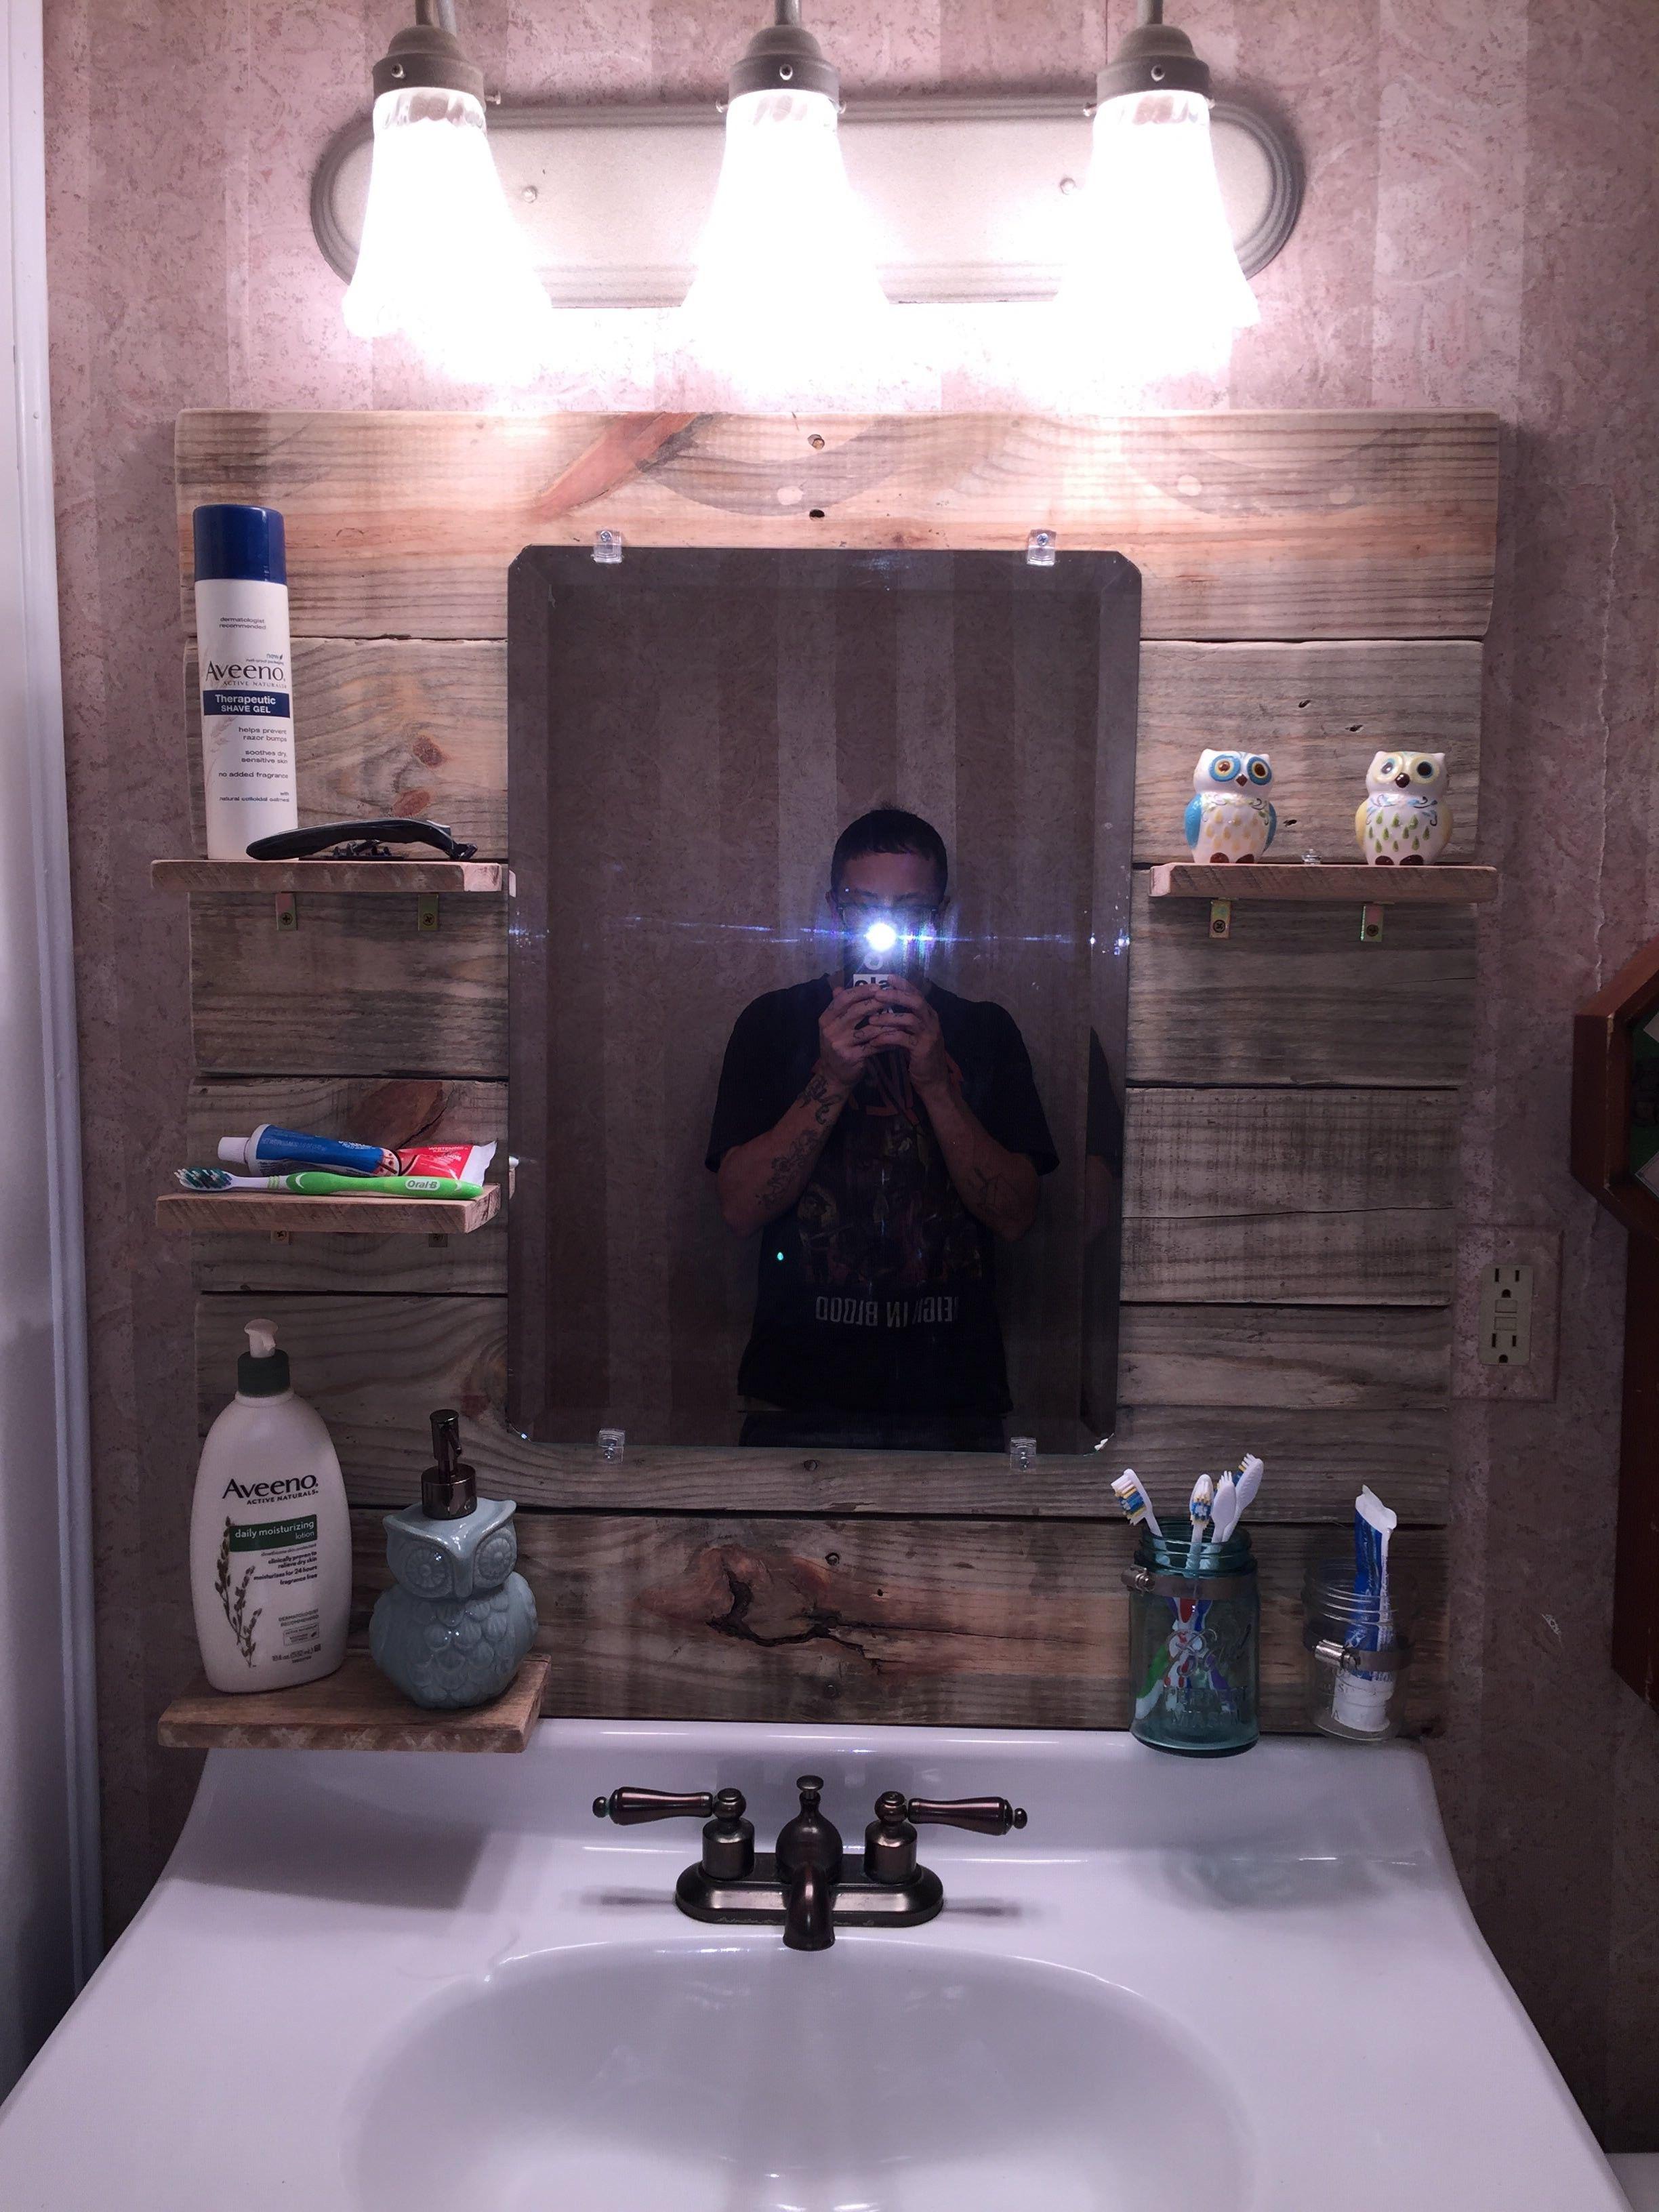 bathroom mirror project pallet wall doors pallet bathroom wood medicine cabinets bathroom. Black Bedroom Furniture Sets. Home Design Ideas